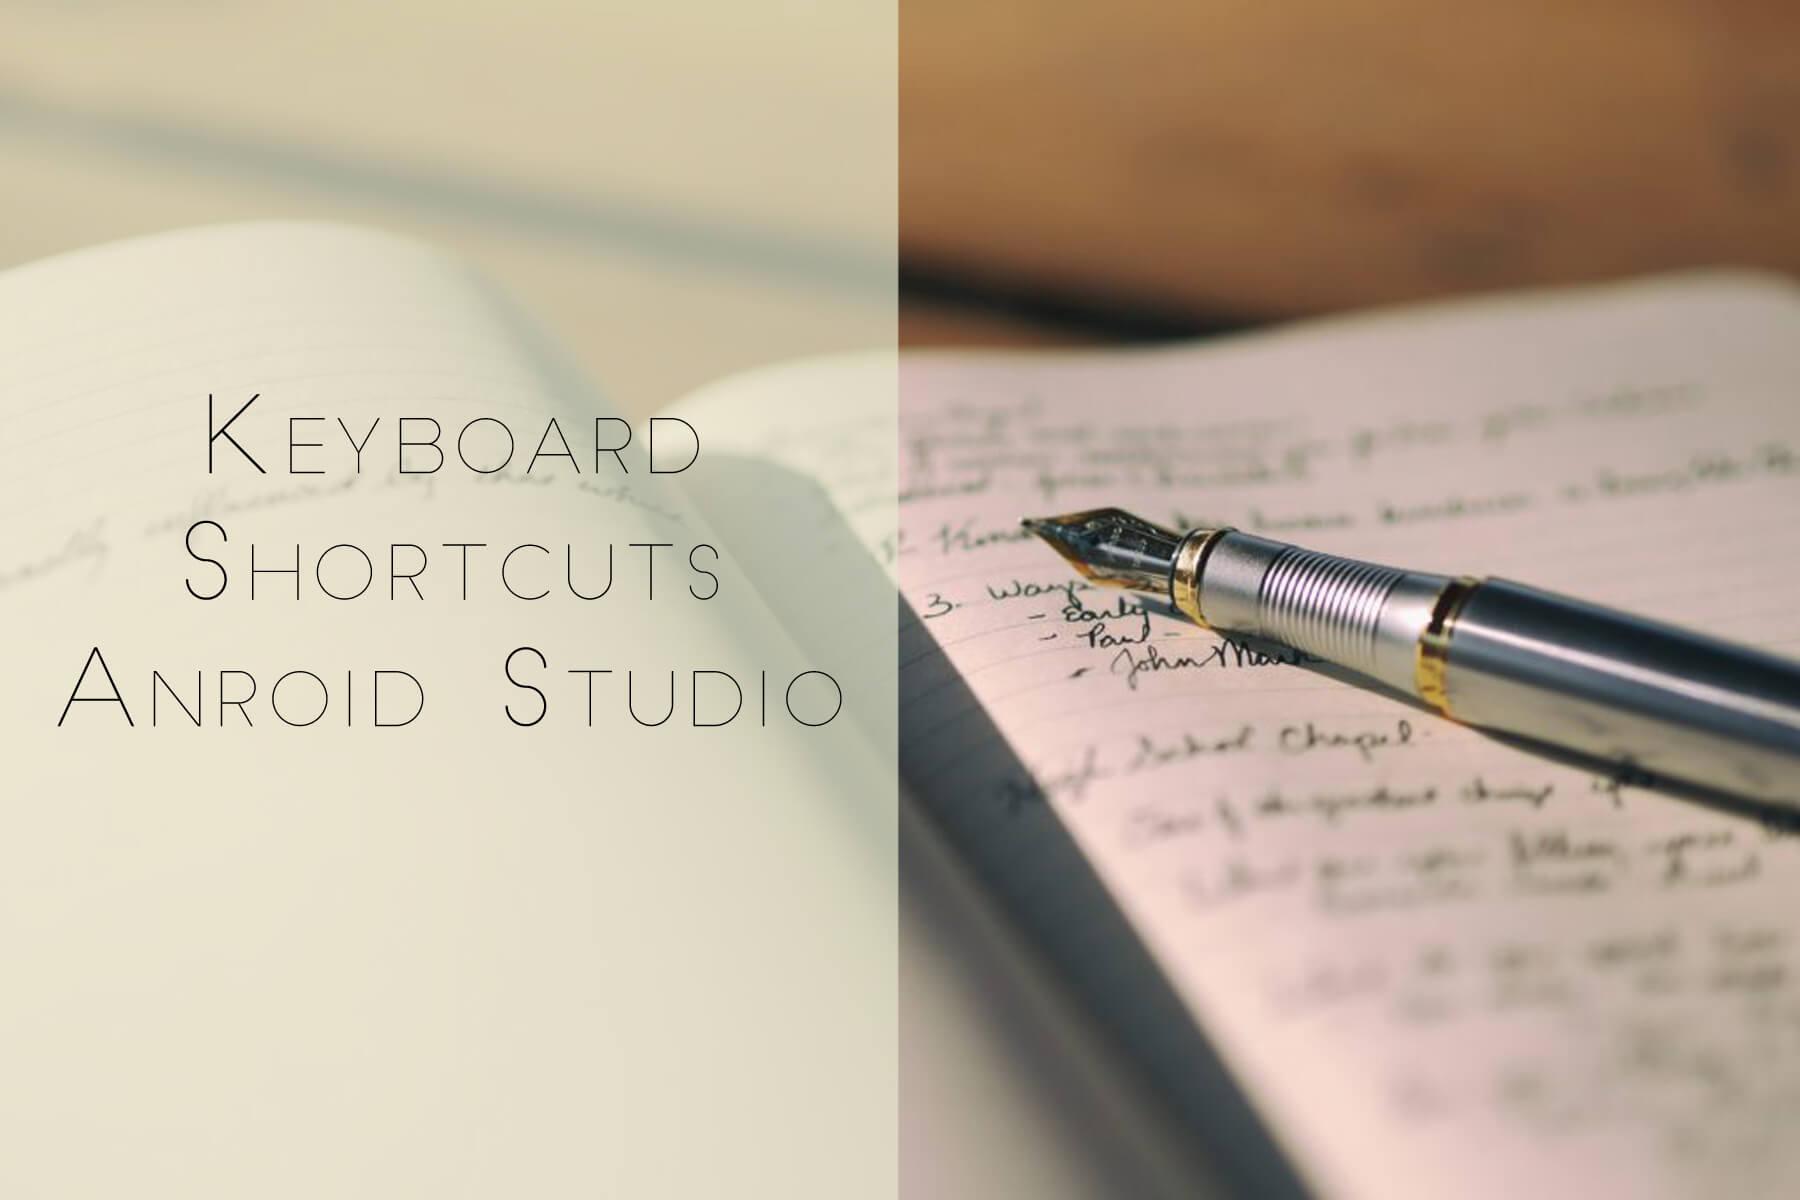 Android Studio Keyboard Shortcuts